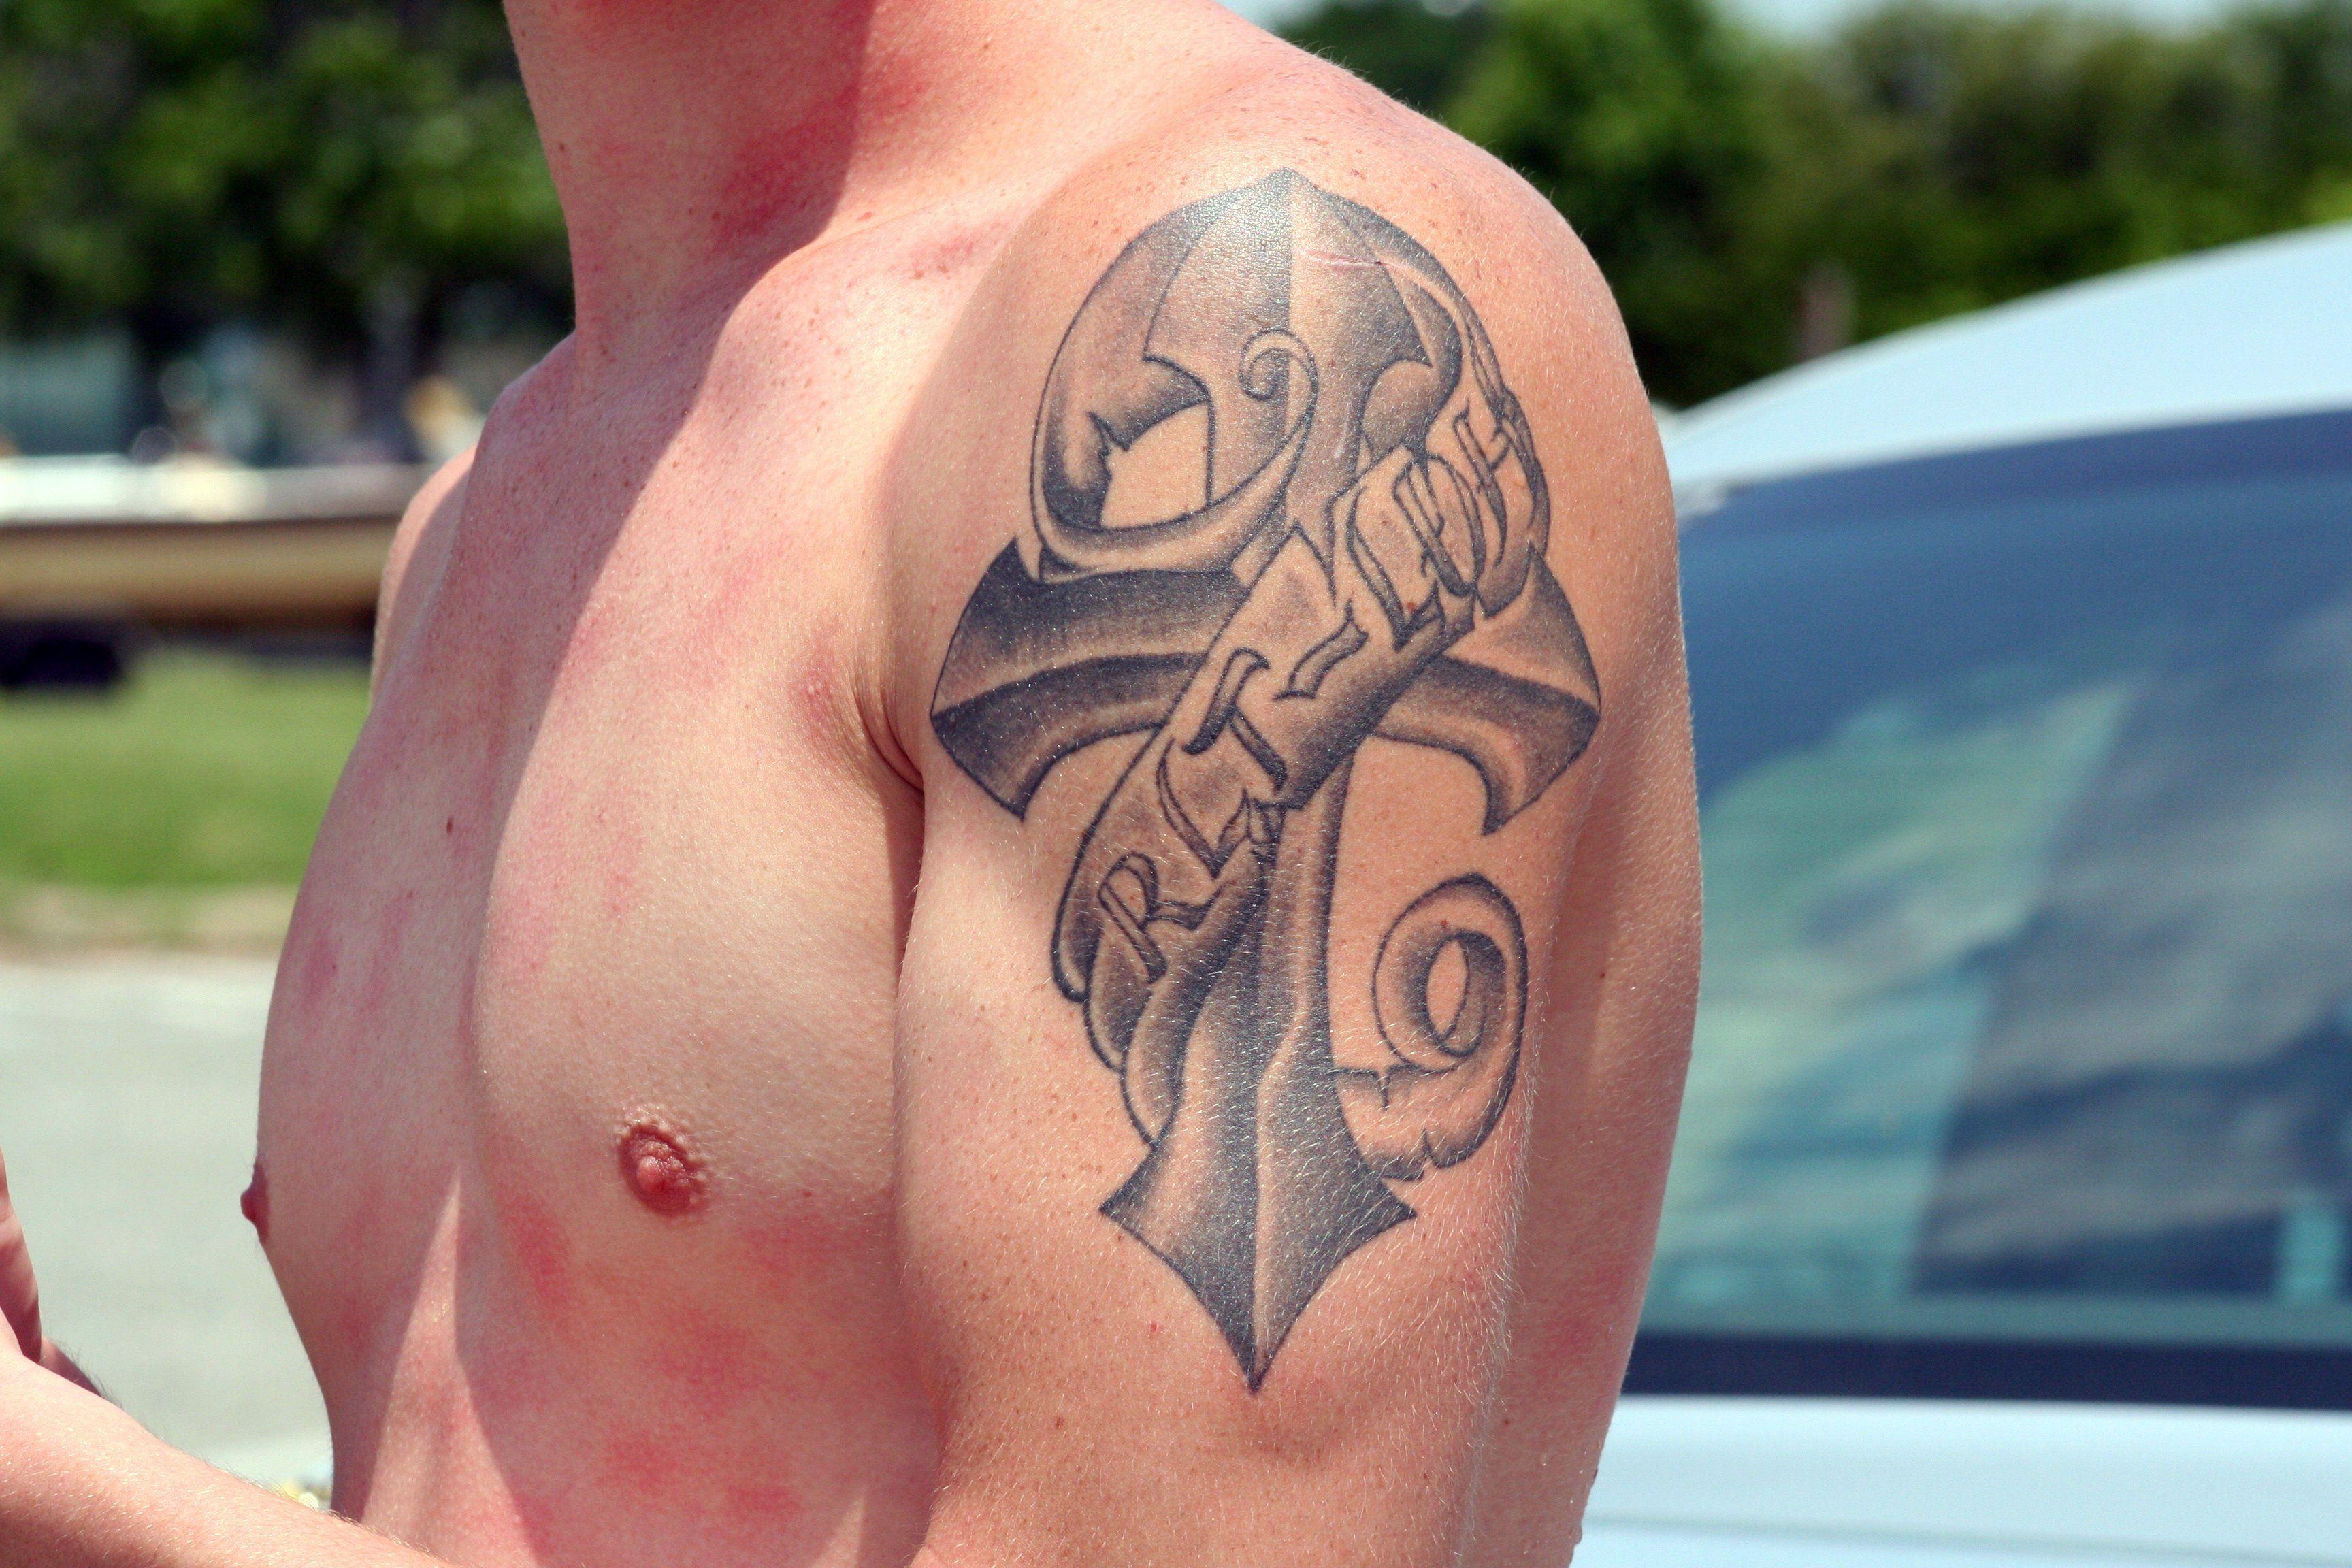 File First Tattoo 3593353968 Jpg Wikimedia Commons Good First Tattoos First Tattoo Tattoos